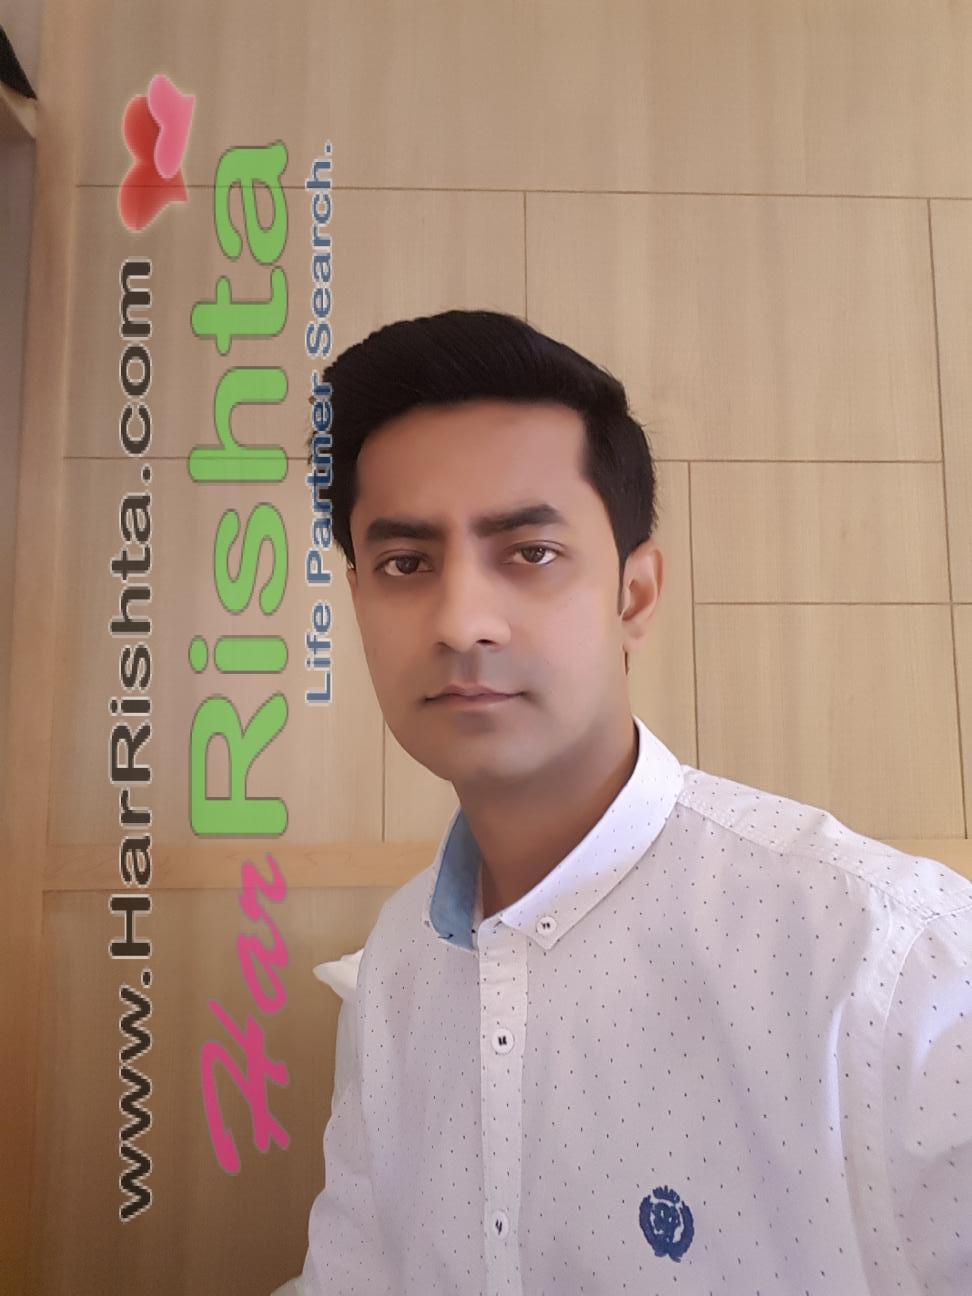 Tareen Boy Rishta in Lahore